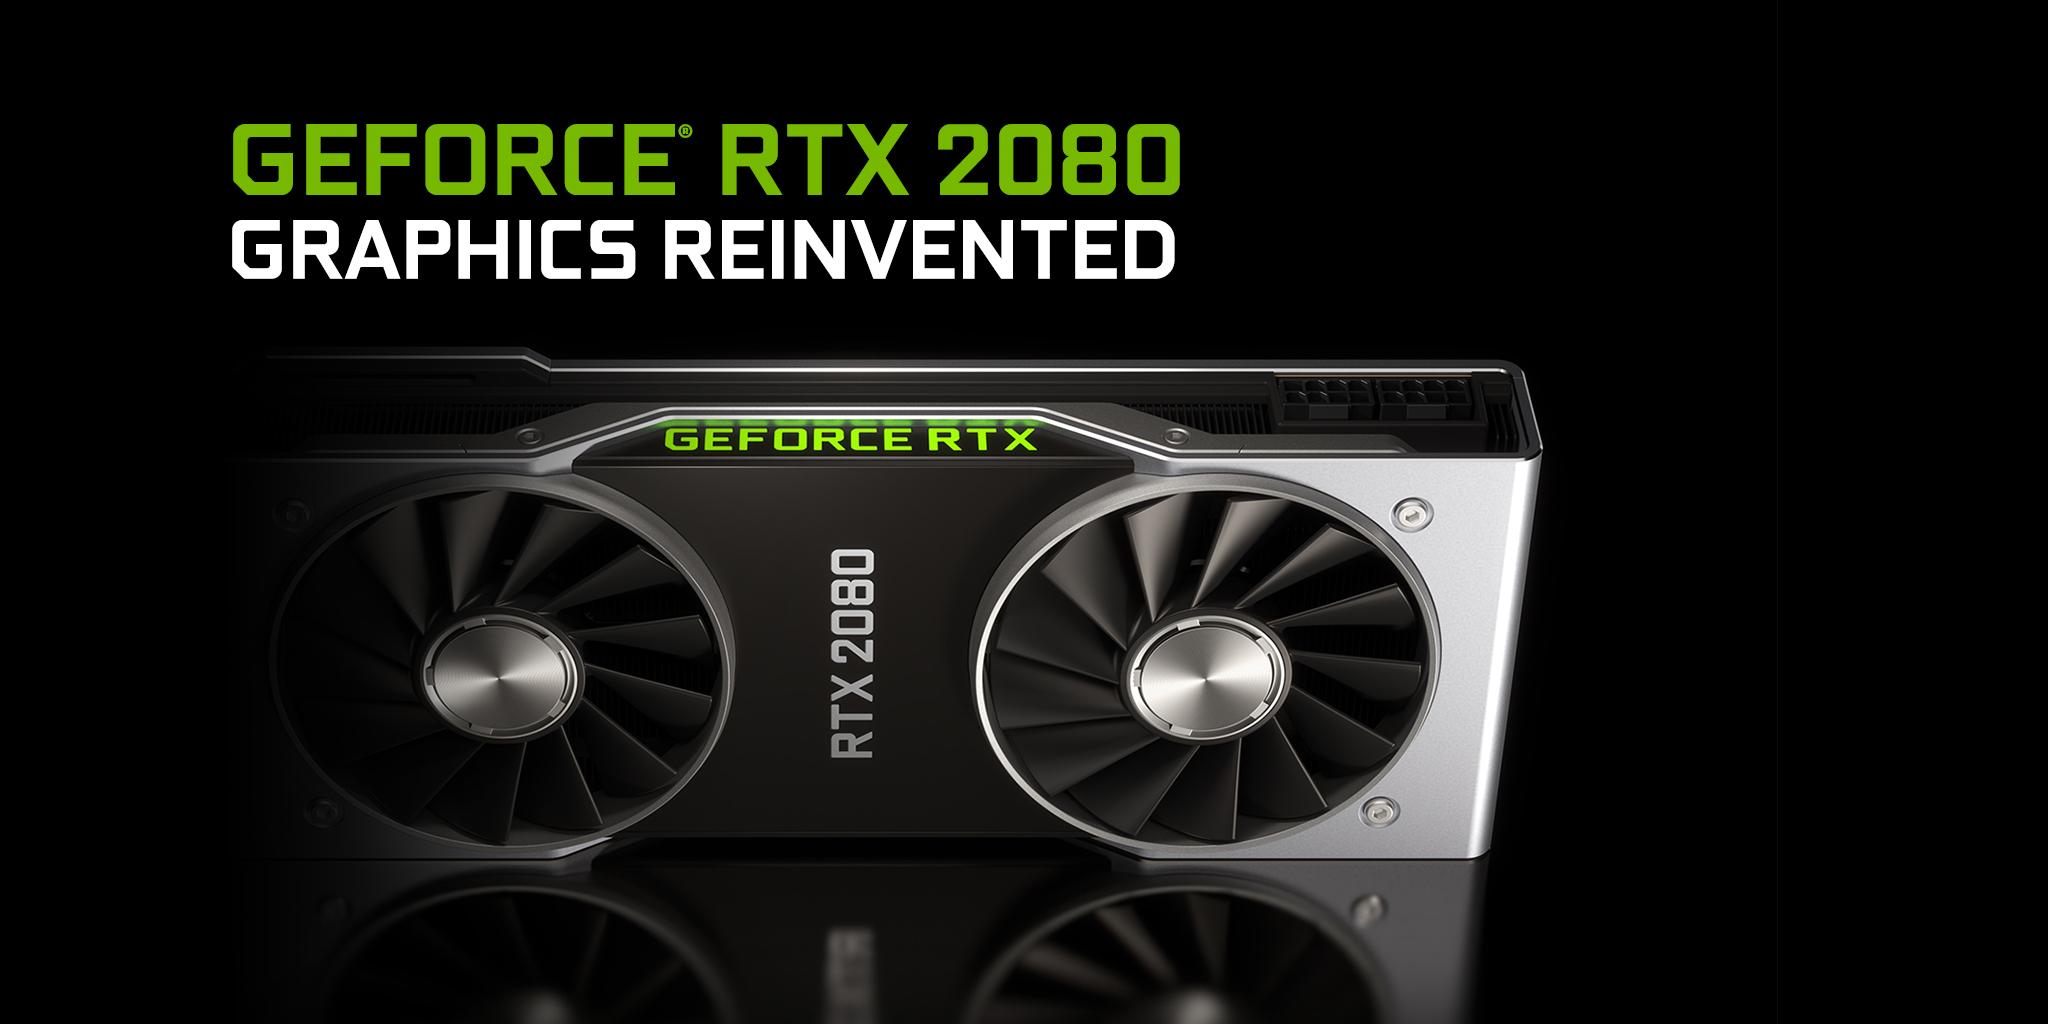 Geforce Rtx 2080 Graphics Card Nvidia